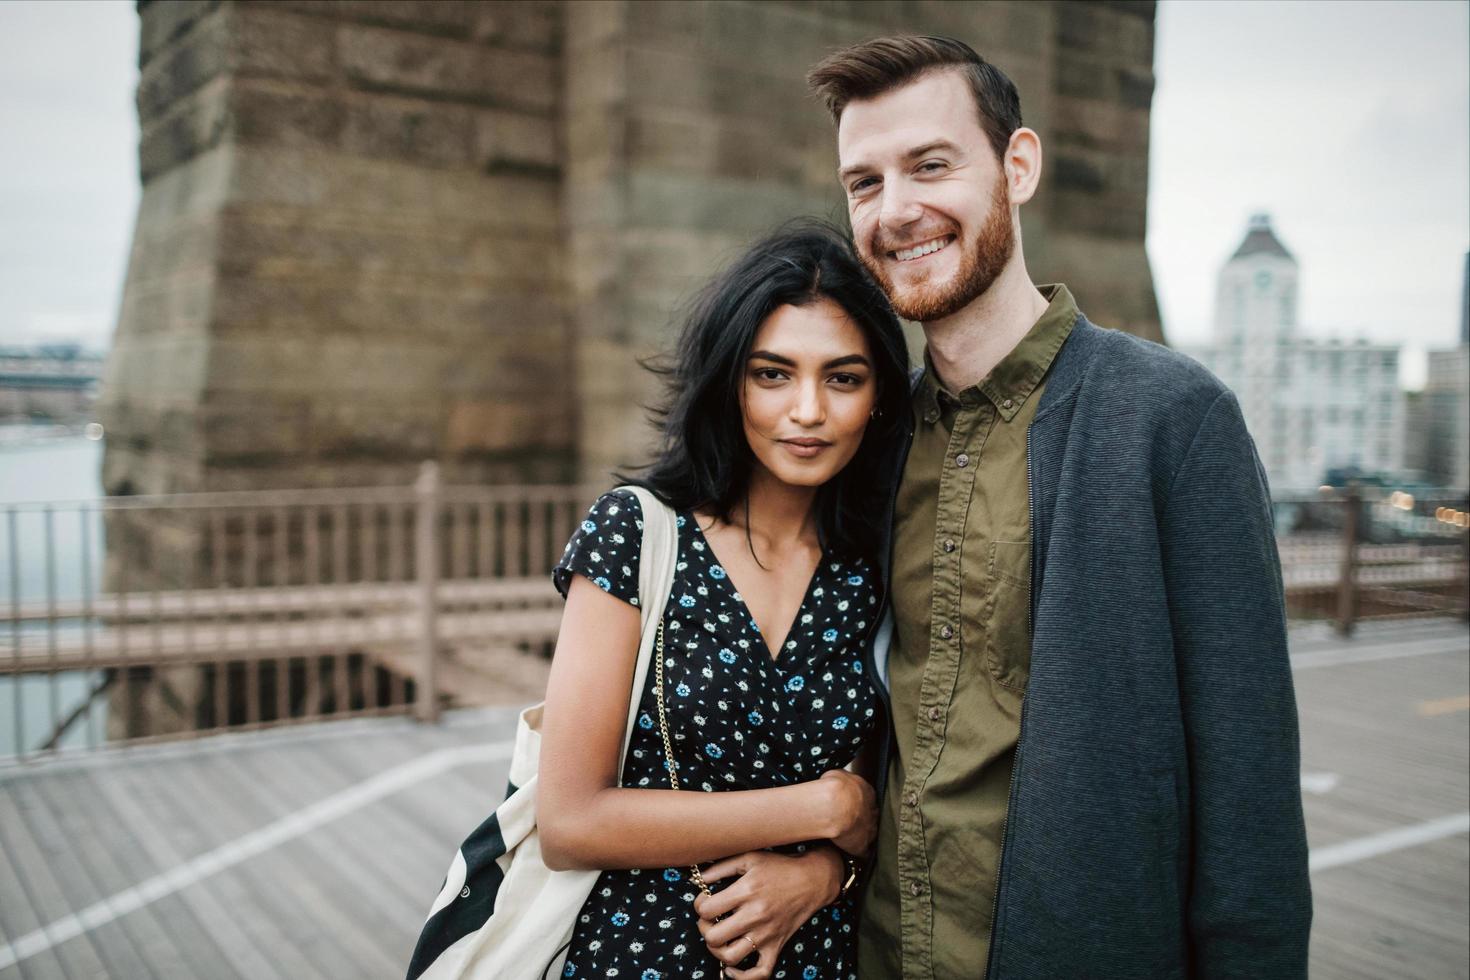 Attractive couple embraces on city bridge photo